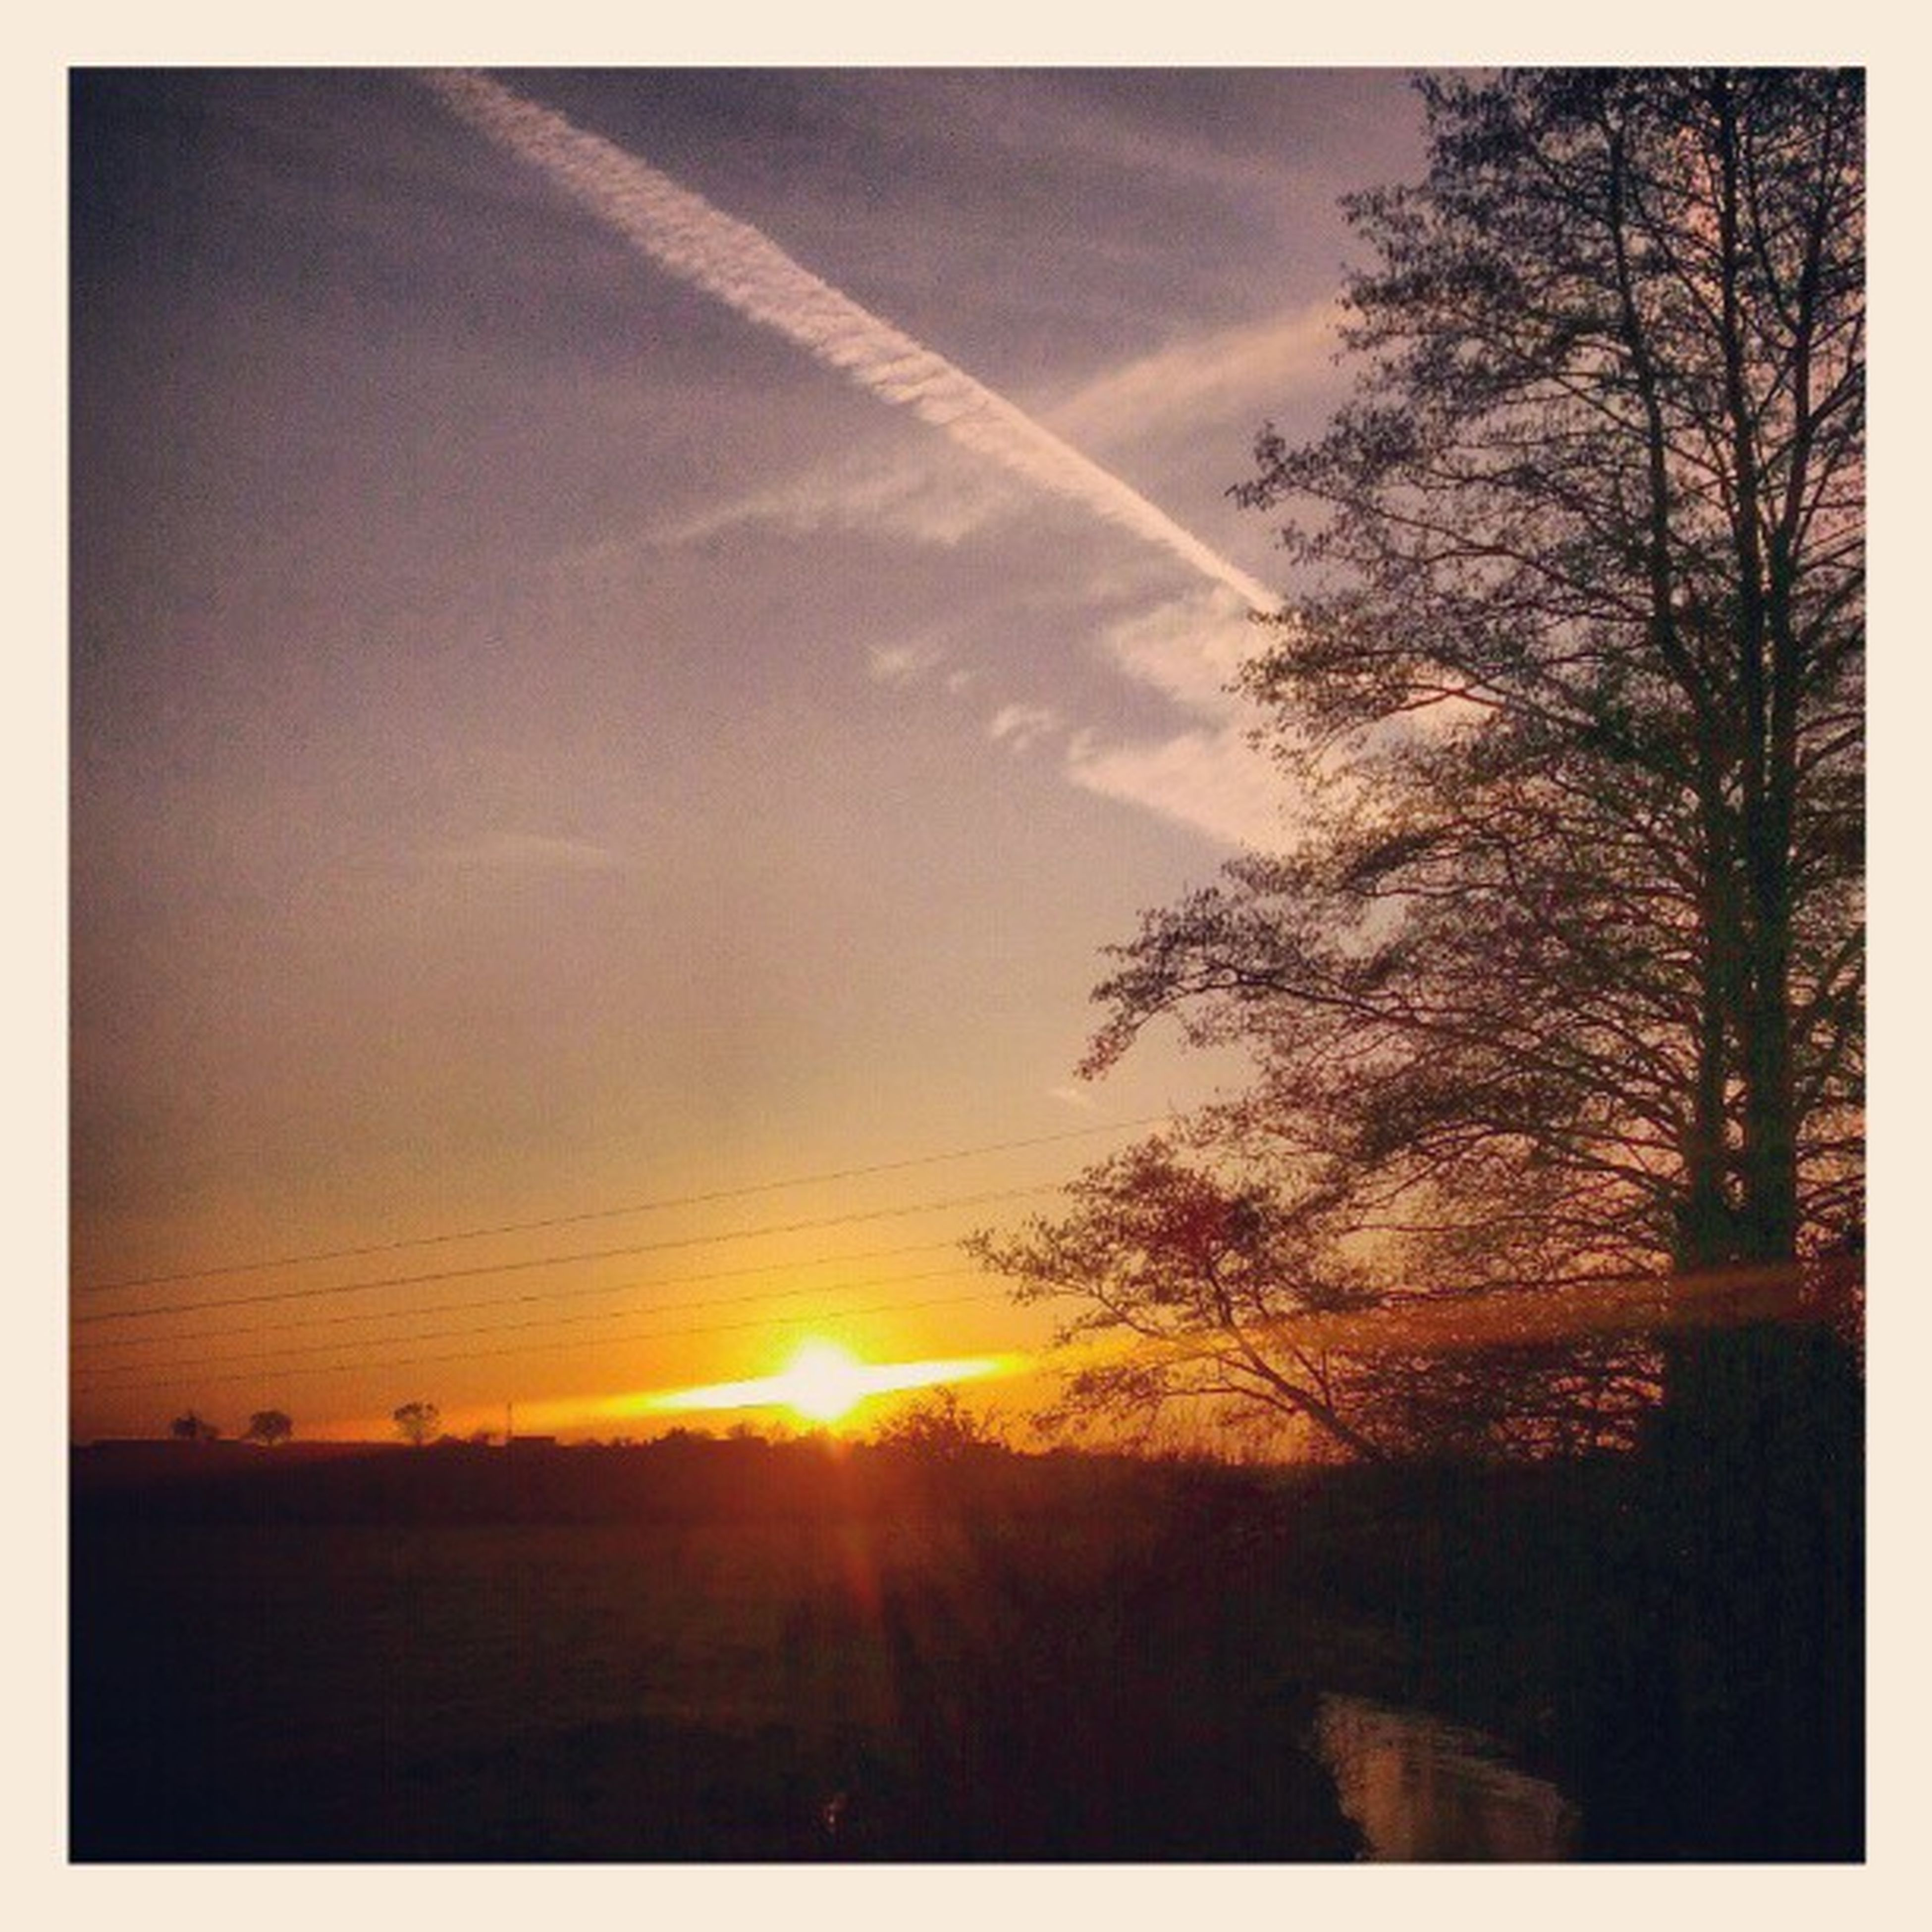 sunset, transfer print, sun, sky, tranquility, scenics, tranquil scene, beauty in nature, tree, silhouette, auto post production filter, sunlight, nature, sunbeam, cloud - sky, idyllic, orange color, cloud, outdoors, lens flare